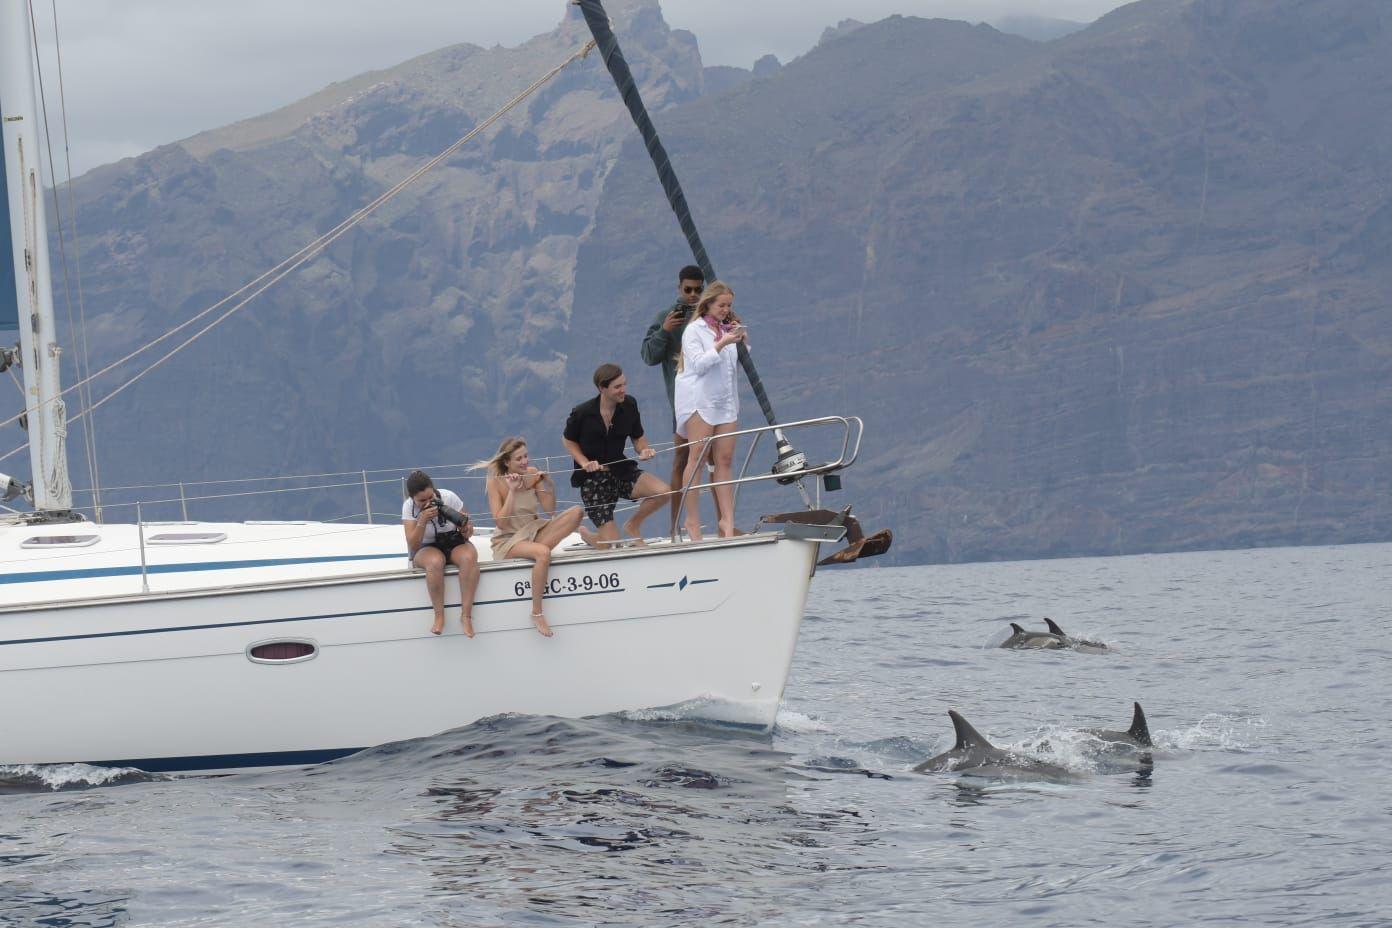 Ballenas y delfines ca06c62a-f89f-429c-82f4-459e7e8f4eea